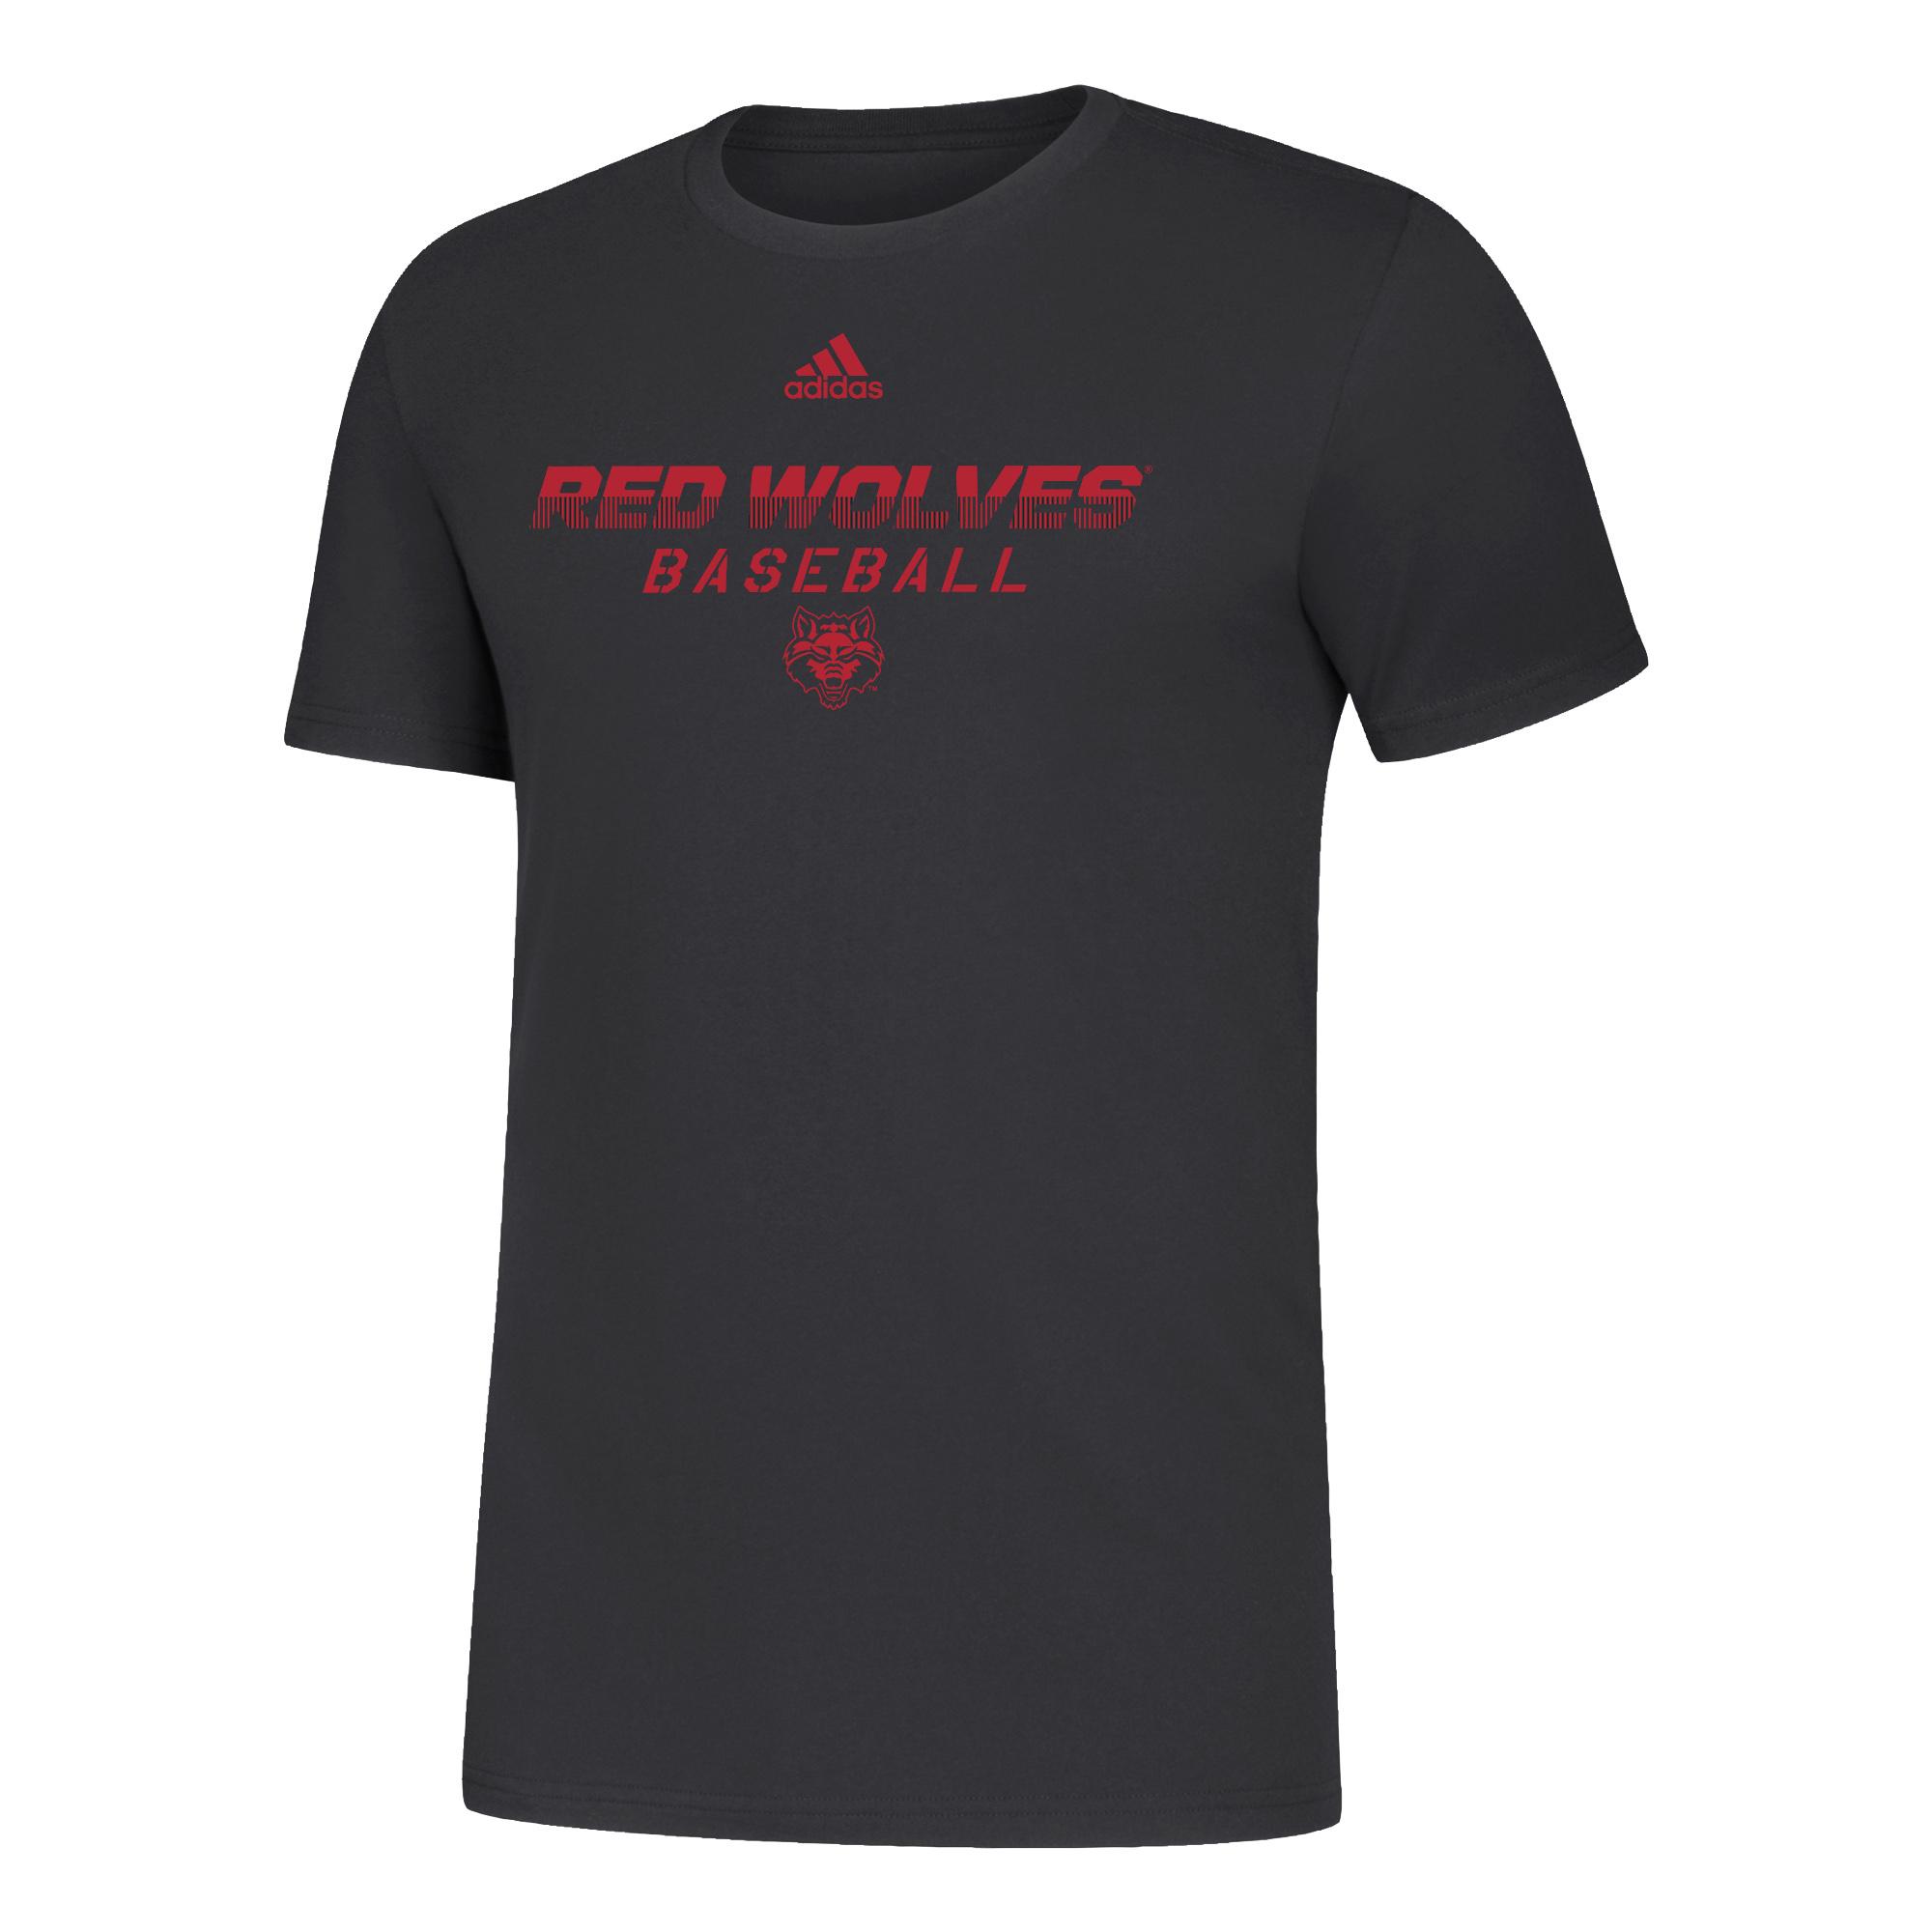 Red Wolves Baseball Amplifier SS Tee